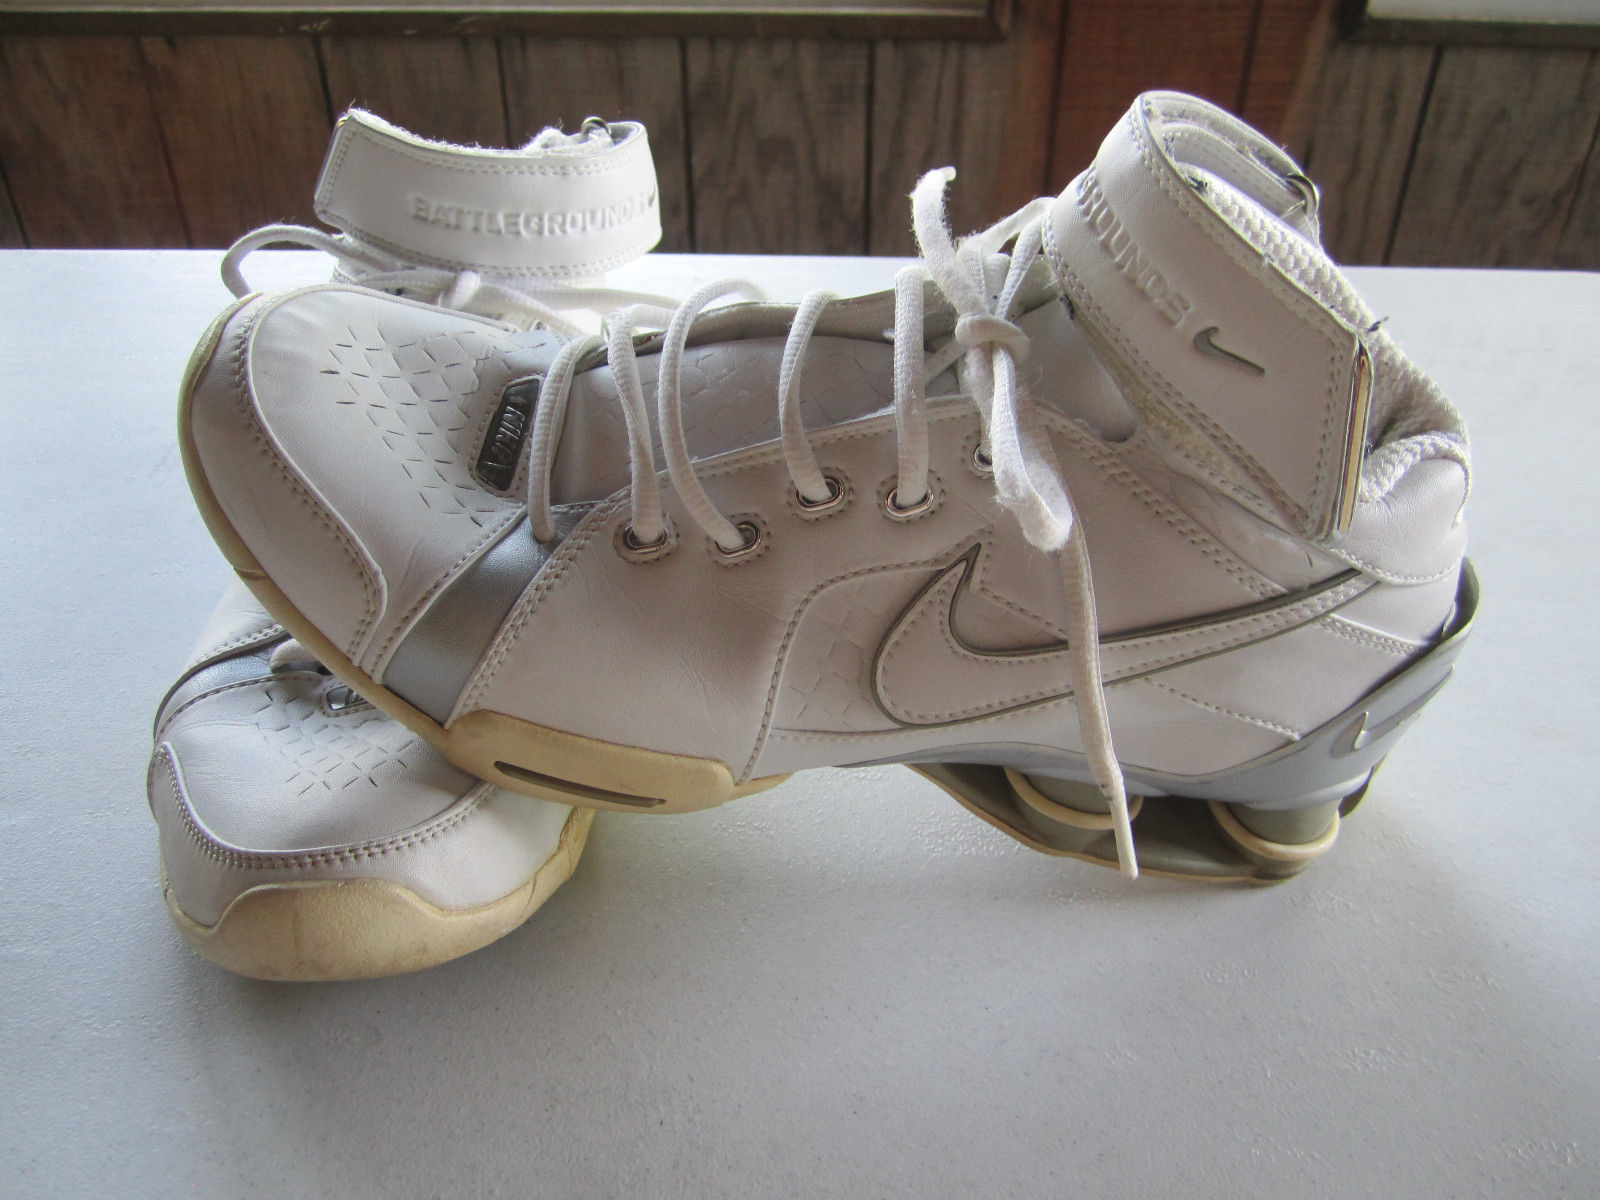 Nike Shox Battlegrounds Men's